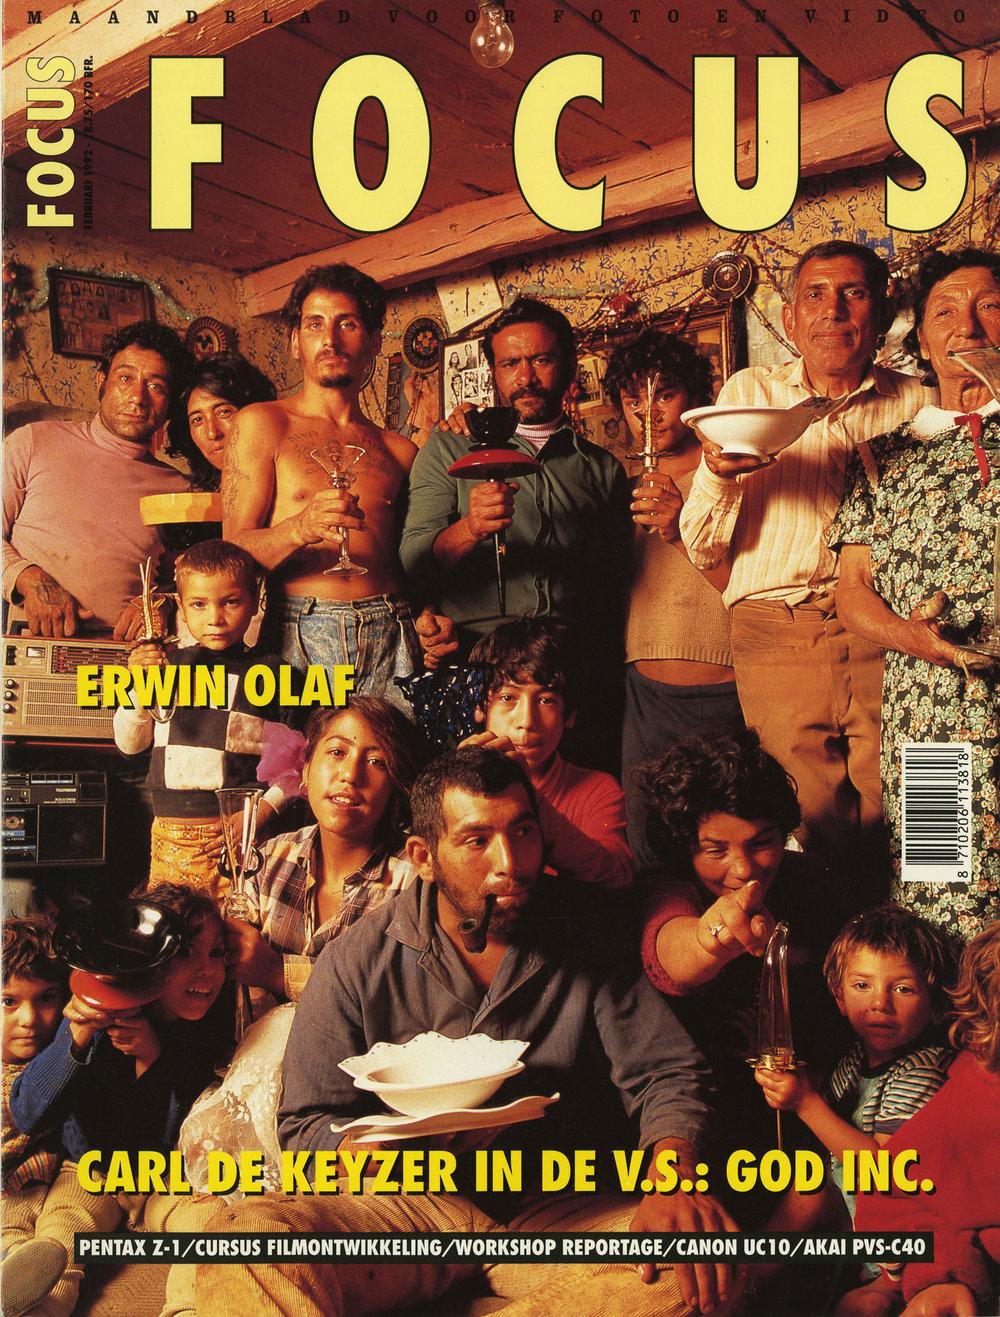 Focus (God, Inc.)